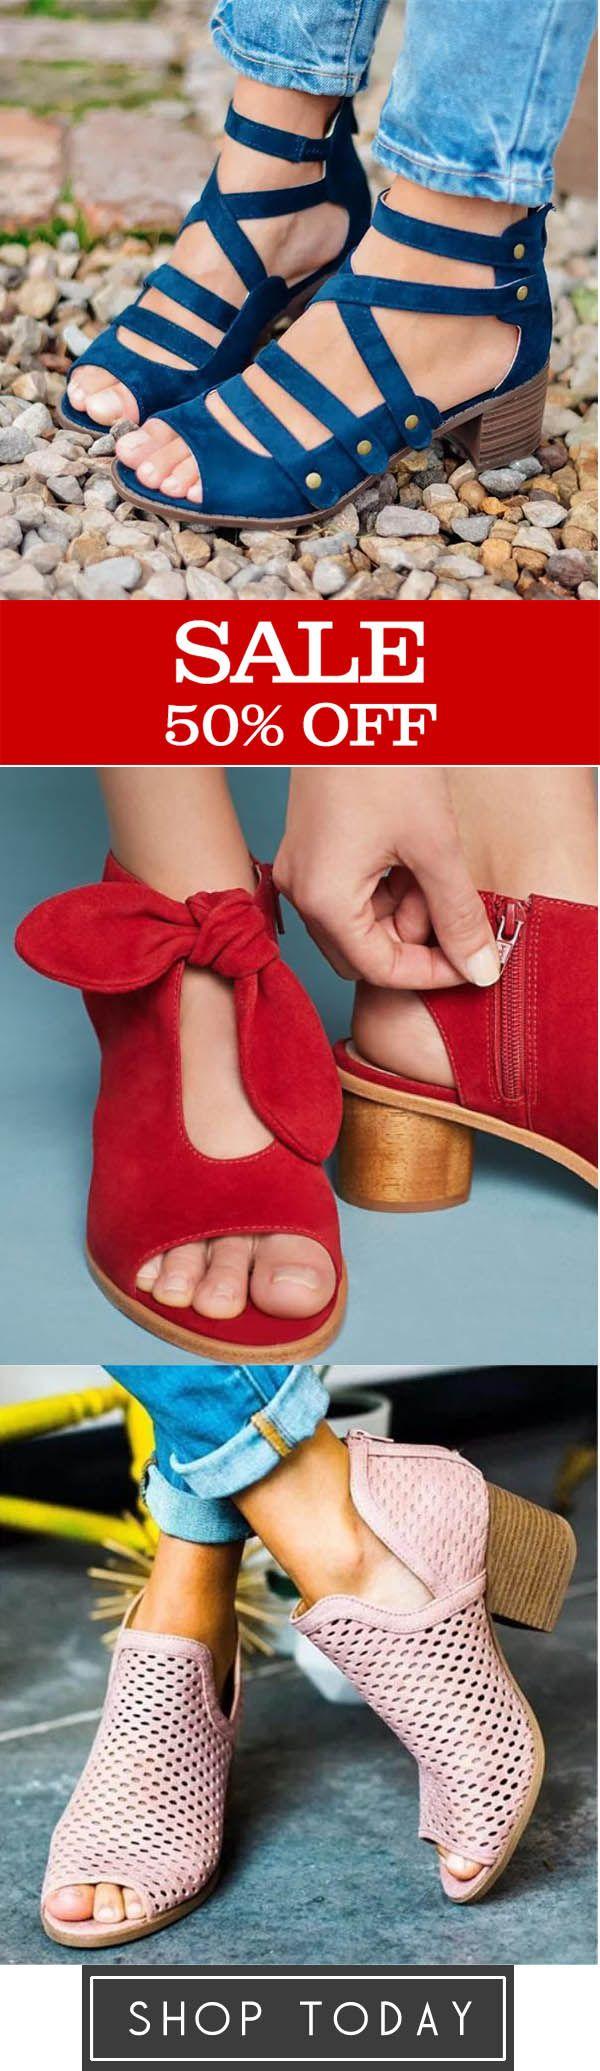 Spring Multi-Strap Heeled Sandals,Bow Peep Toe Hee…